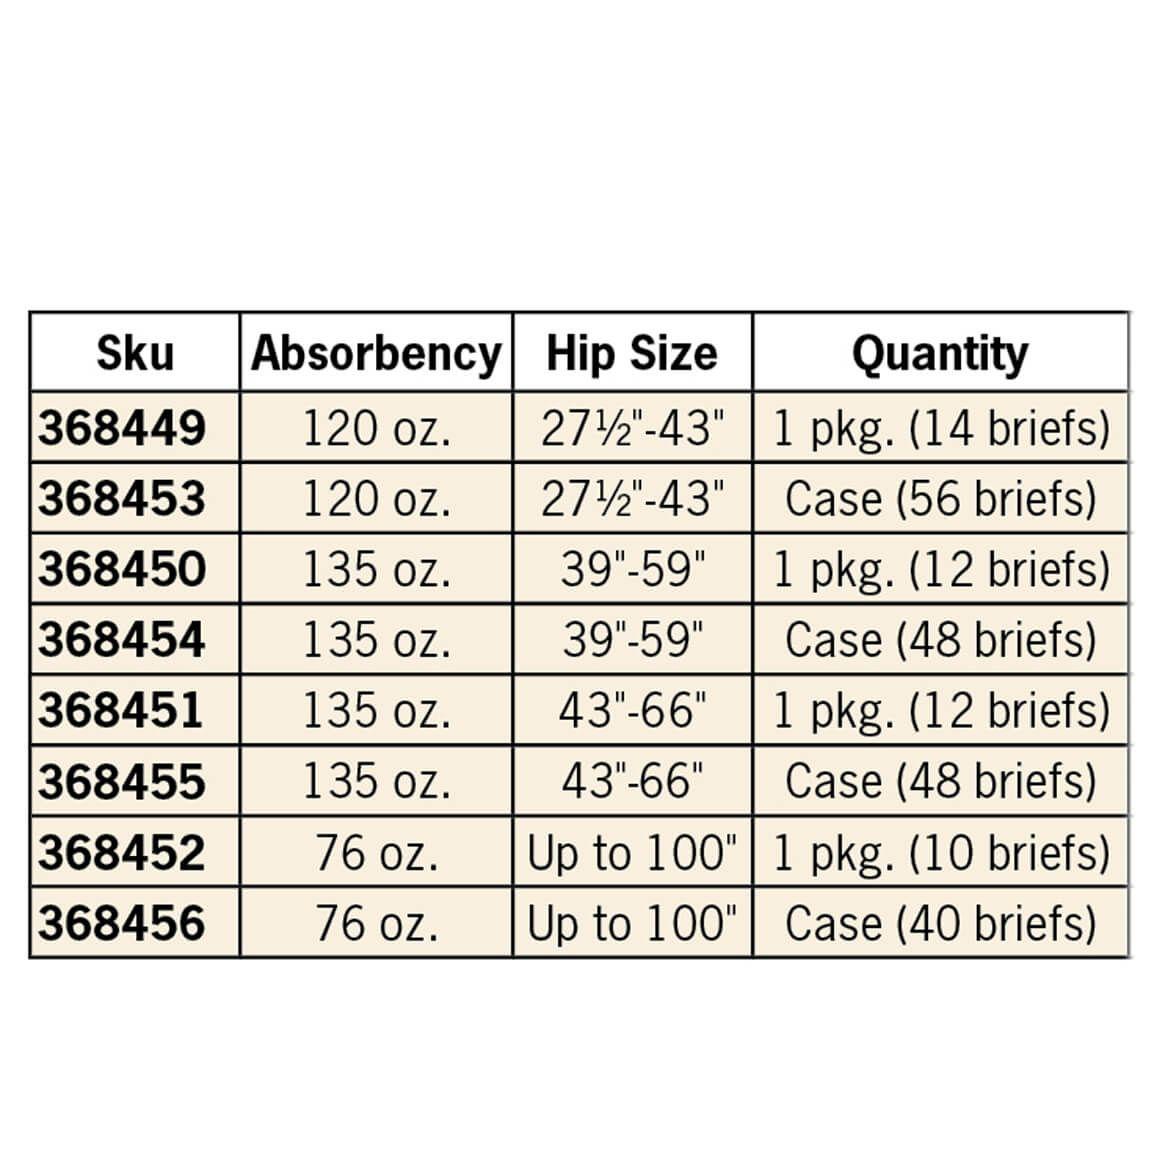 Abri-Form™ 76oz. Premium Adult Briefs 2XL, Pack of 10-368452